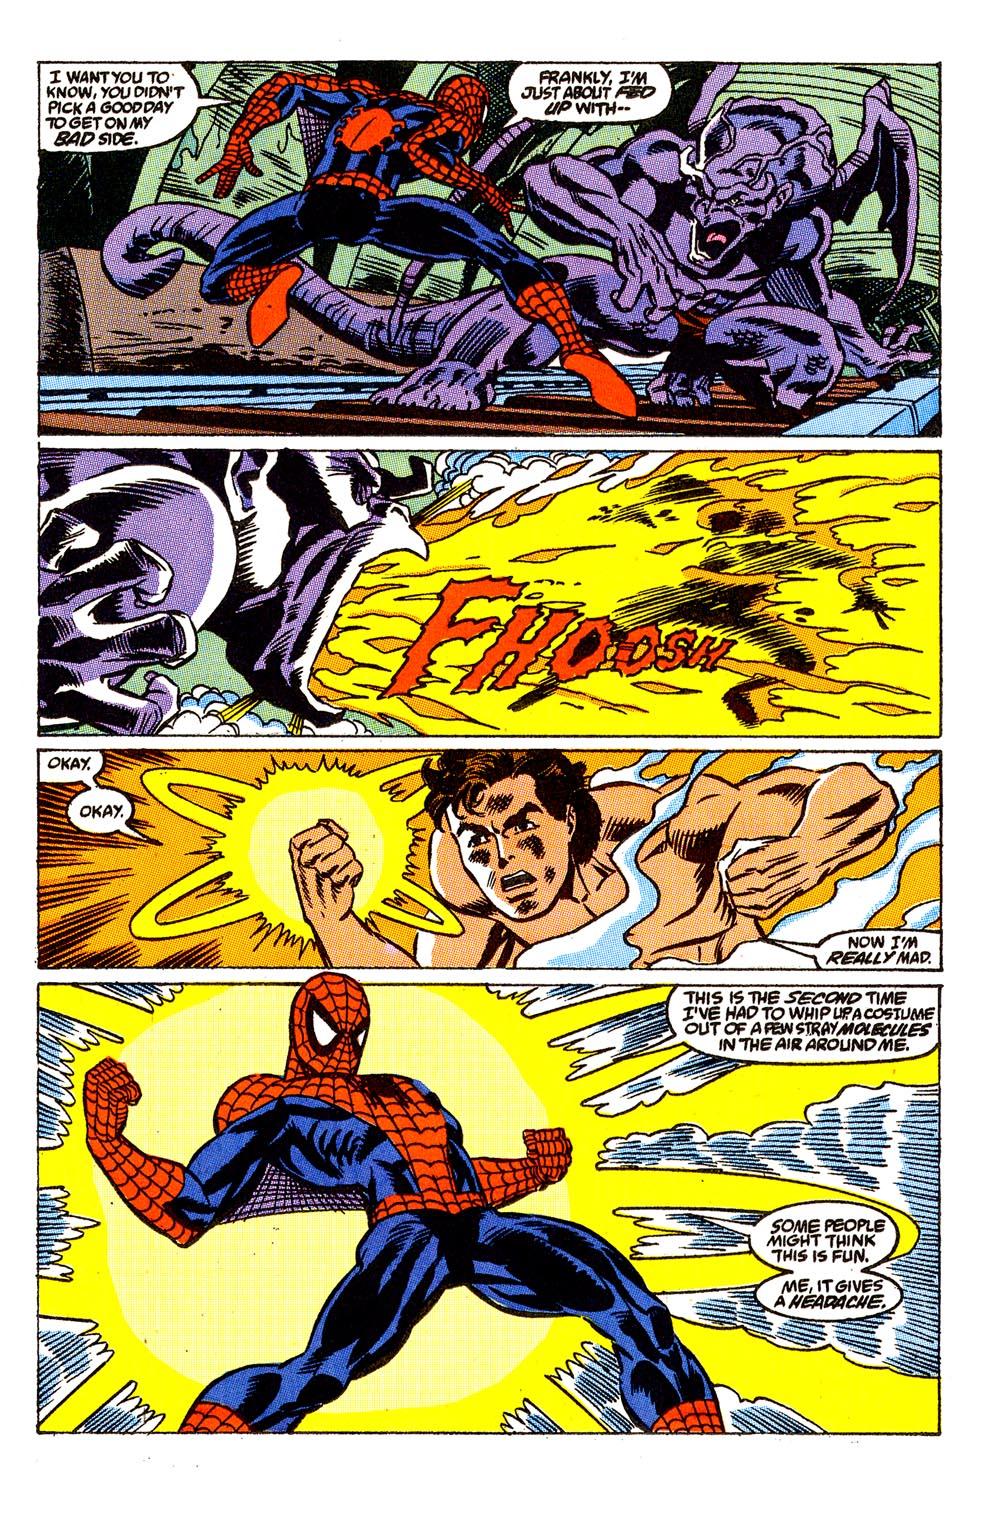 Web of Spiderman 061 15.jpg